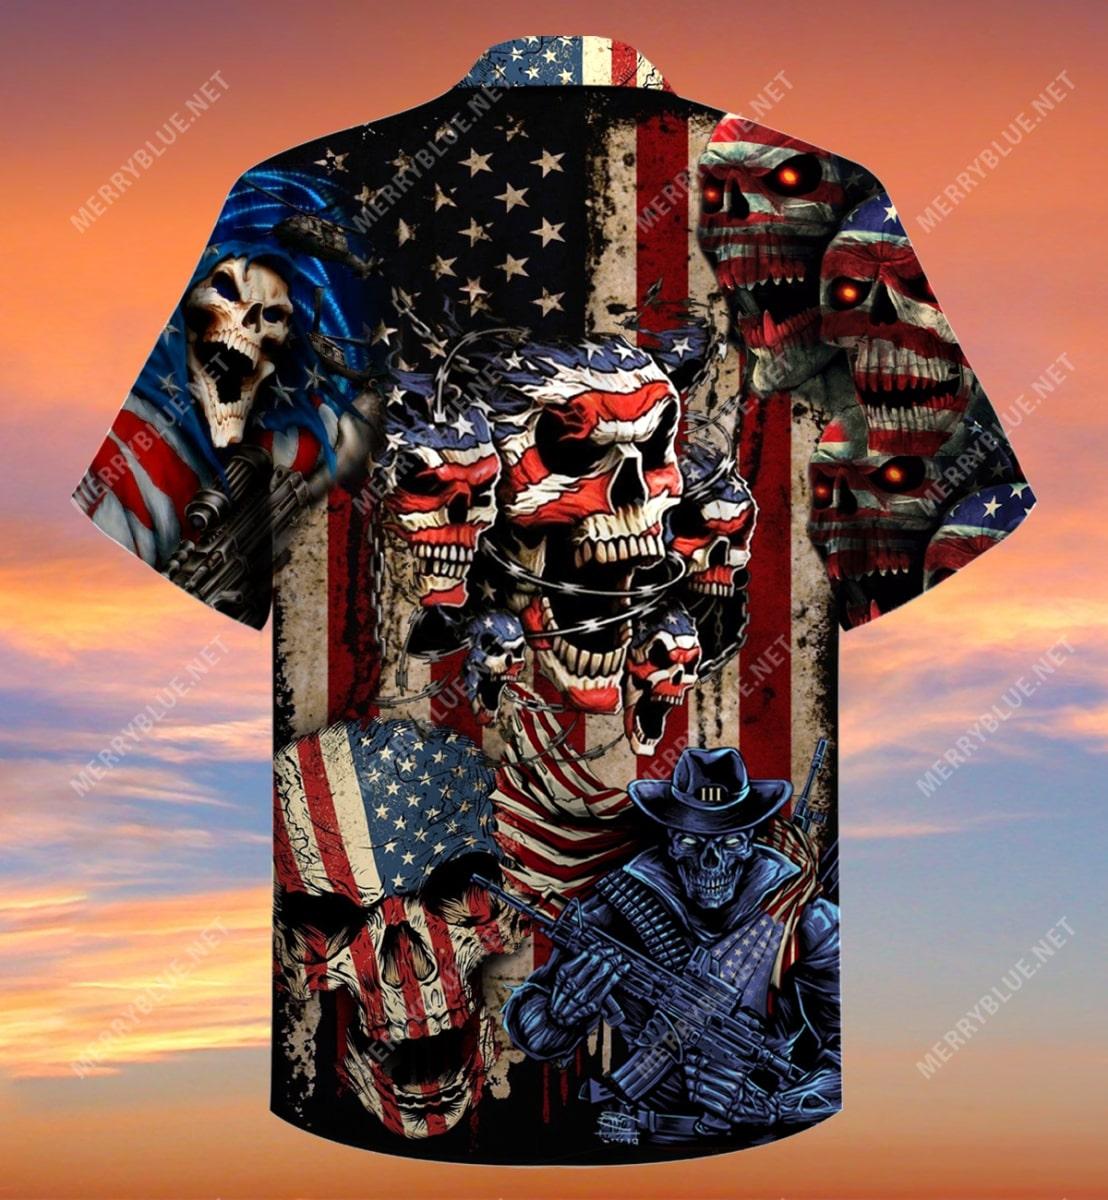 american flag skull all over printed hawaiian shirt 4